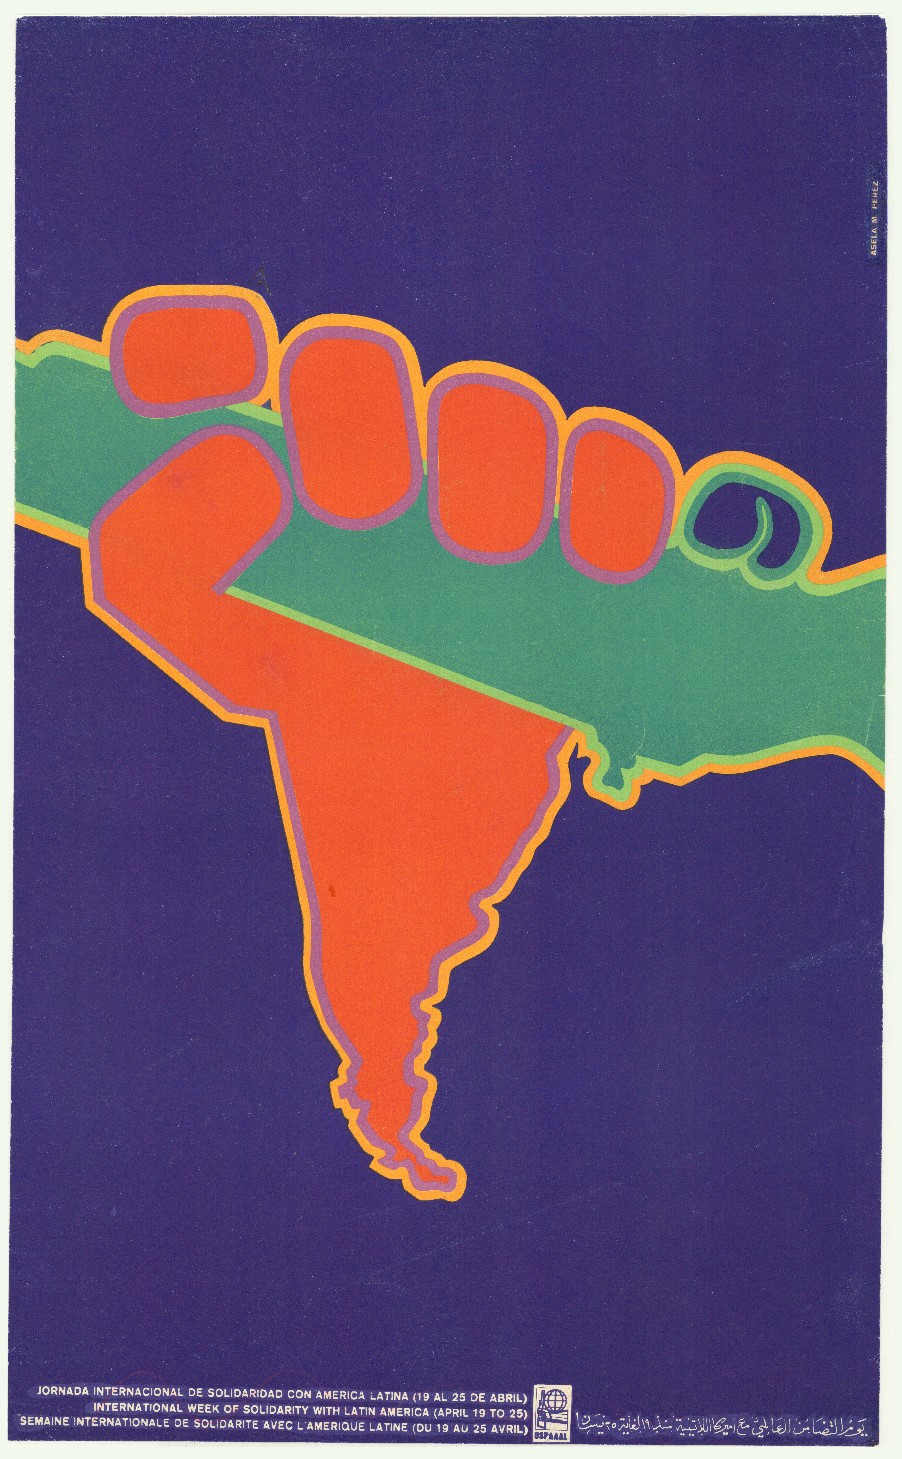 Asela M. Perez, Jornada internacional de solidaridad con America Latina (Internationale dag van solidariteit met Latijns-Amerika), 1970. Collectie Stedelijk Museum Amsterdam